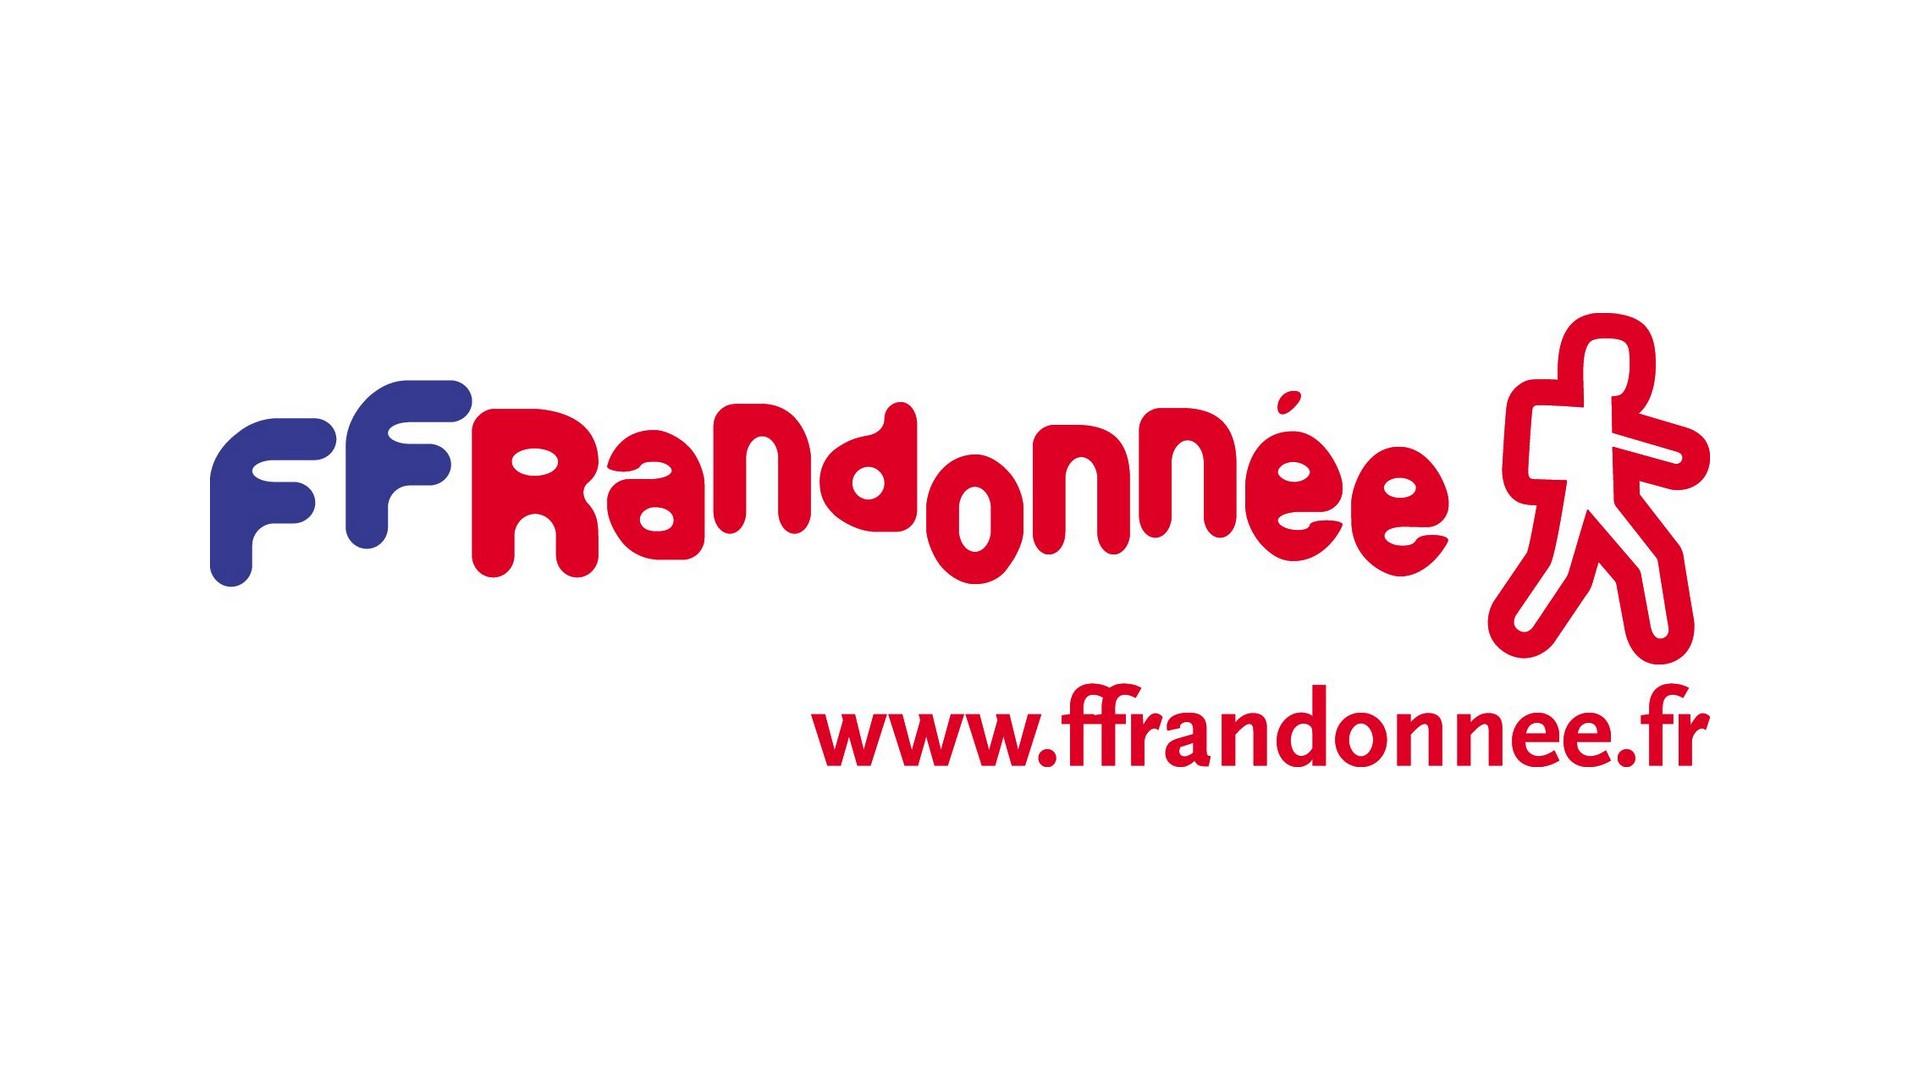 Fédération française de randonnée (1) logo